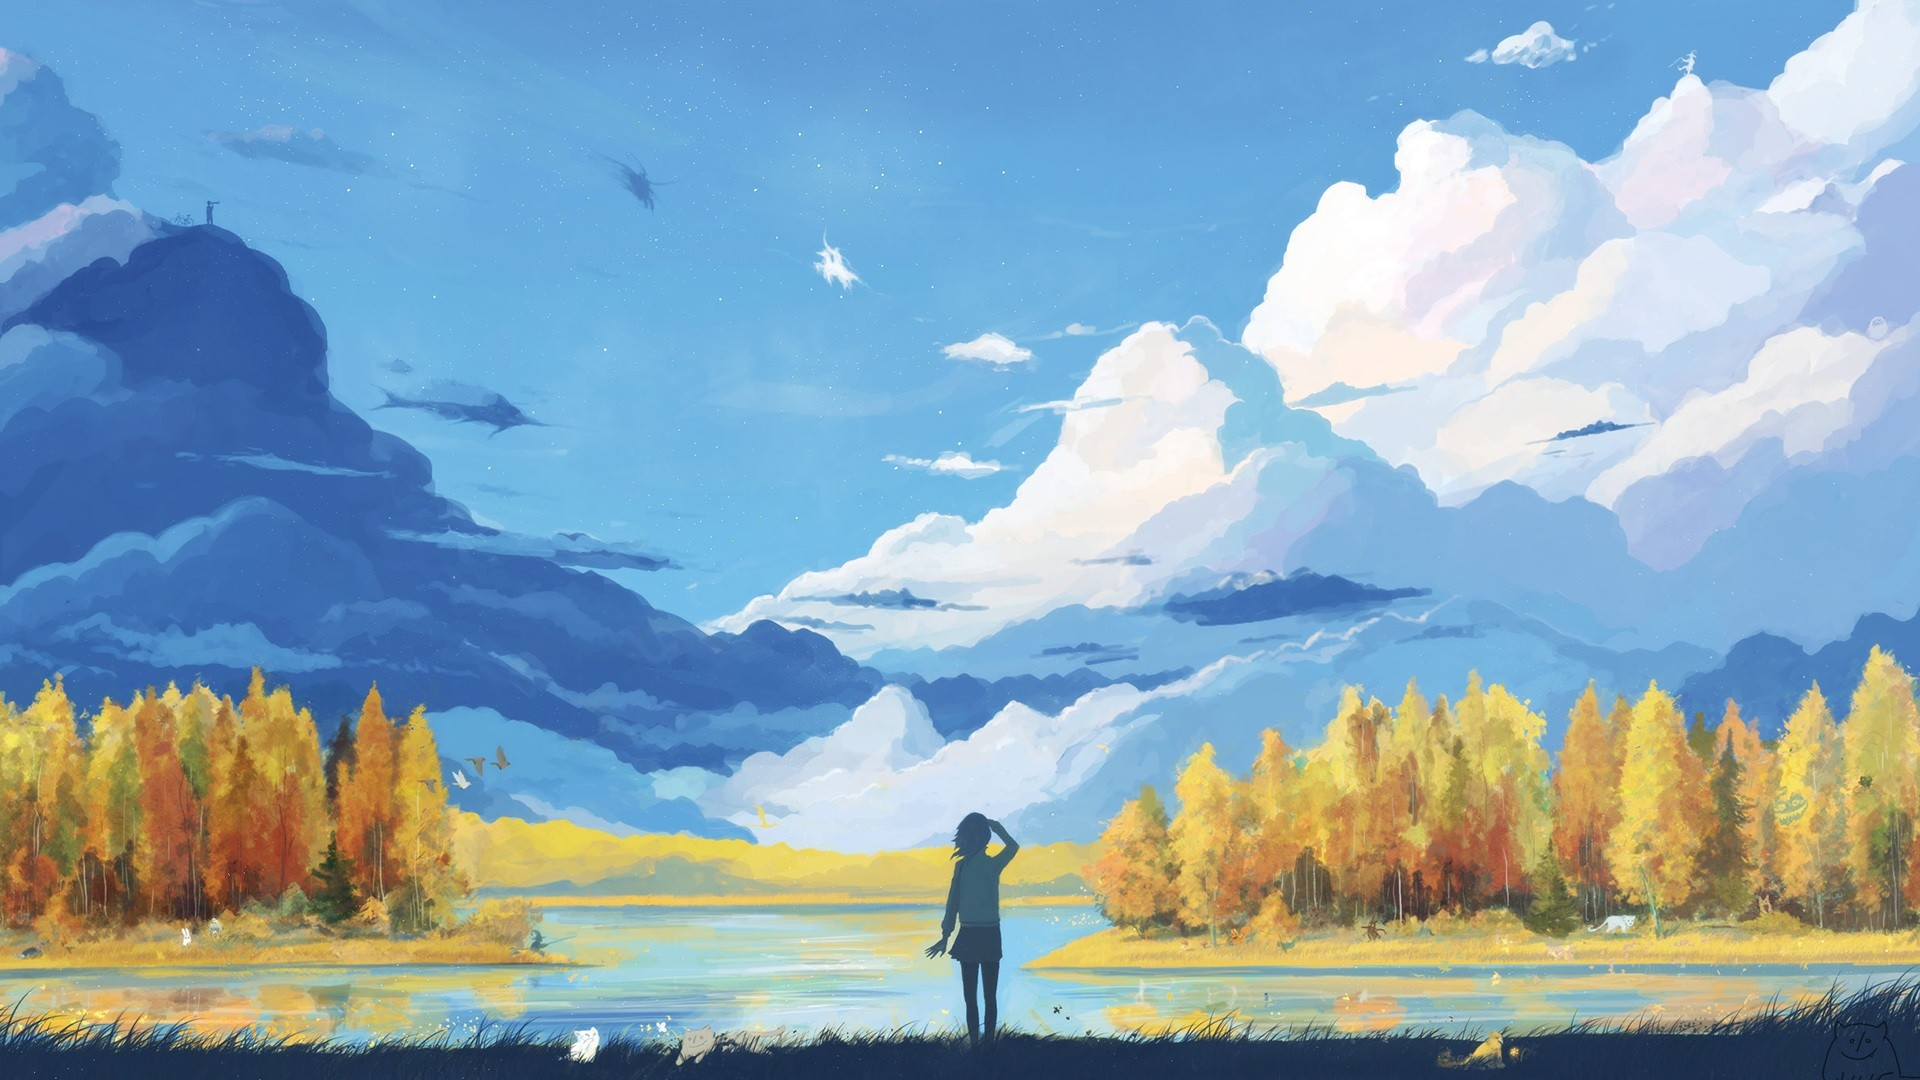 1920x1080 Wallpaper 1920x1080 Px, Anime, Fantasy Art, Landscape